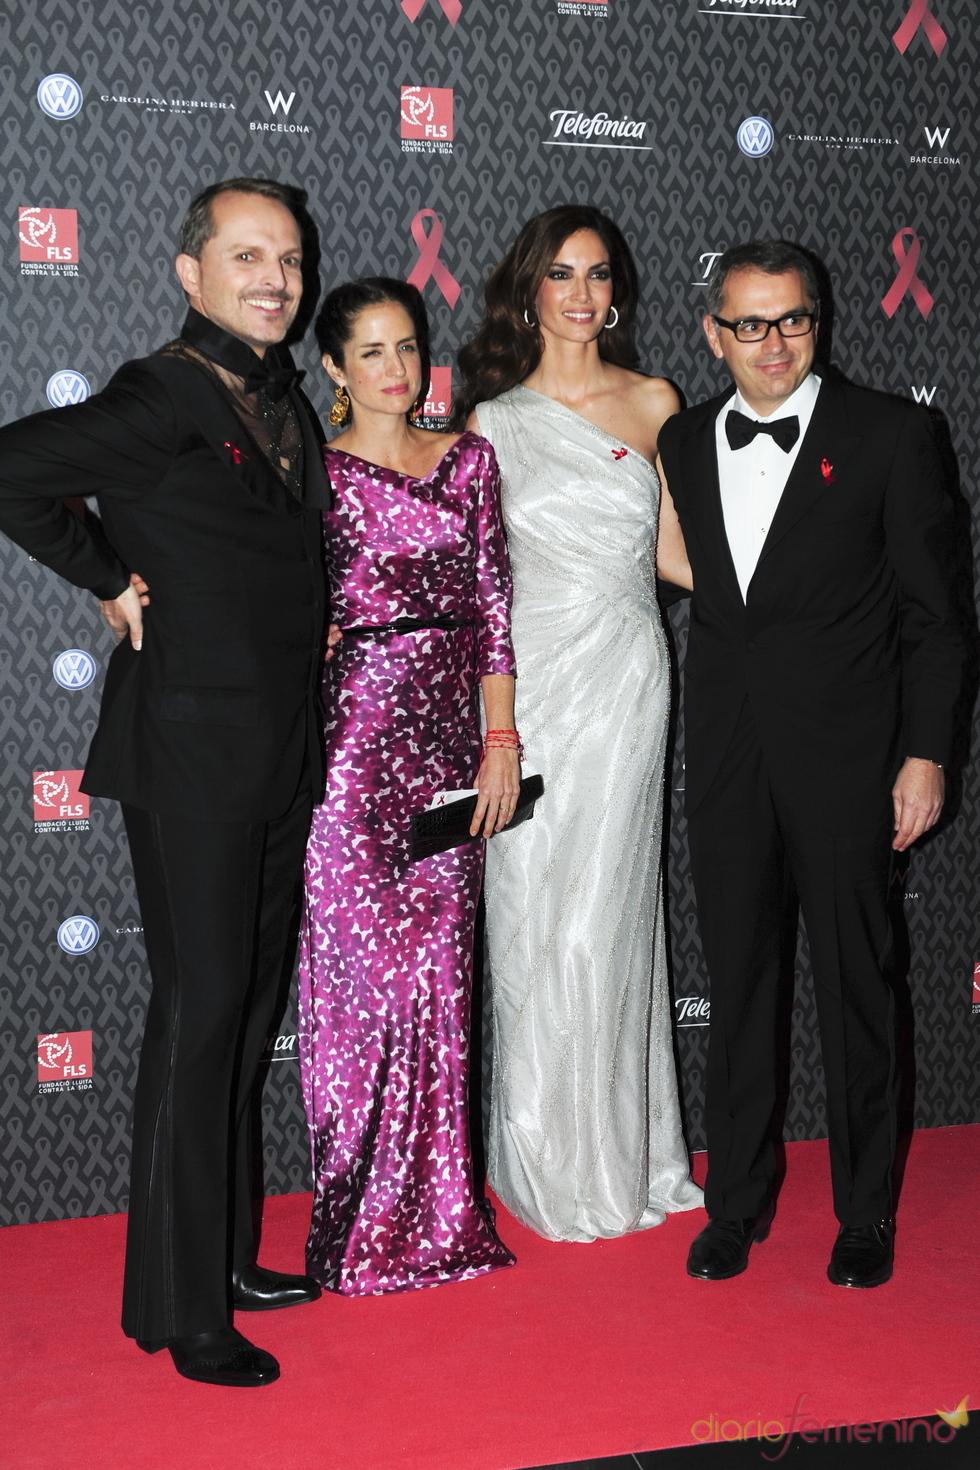 Carolina Adriana Herrera, perfecta en la gala contra el Sida 2010